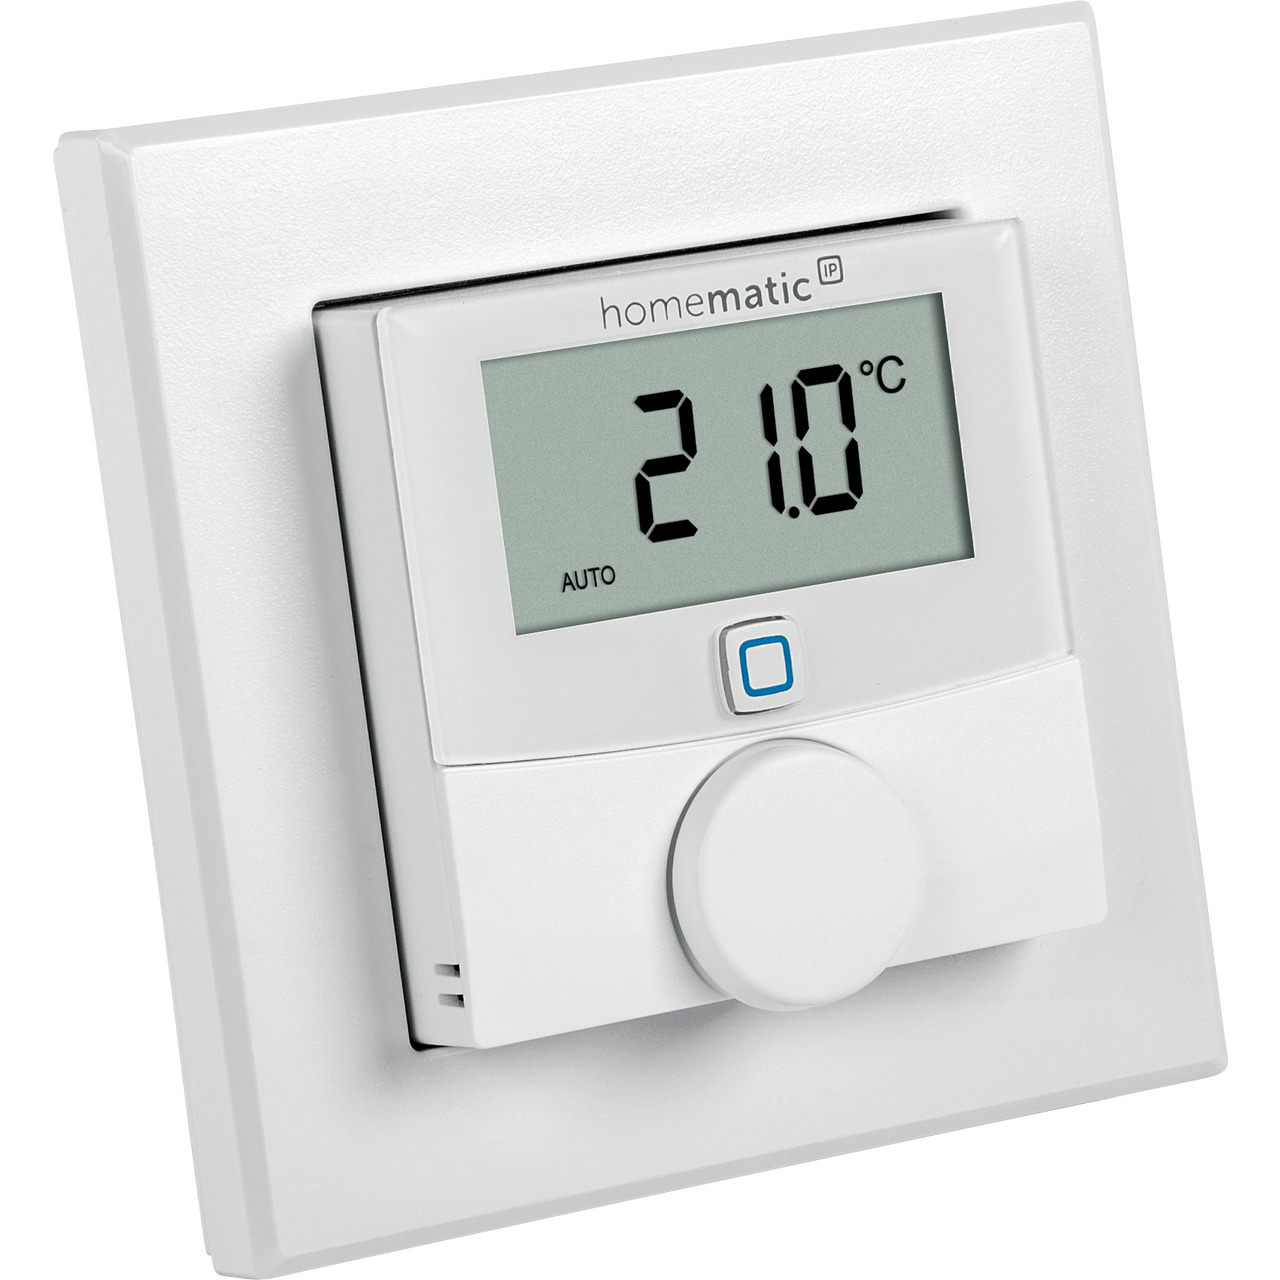 Homematic IP Wired Smart Home Wandthermostat mit Luftfeuchtigkeitssensor HmIPW-WTH